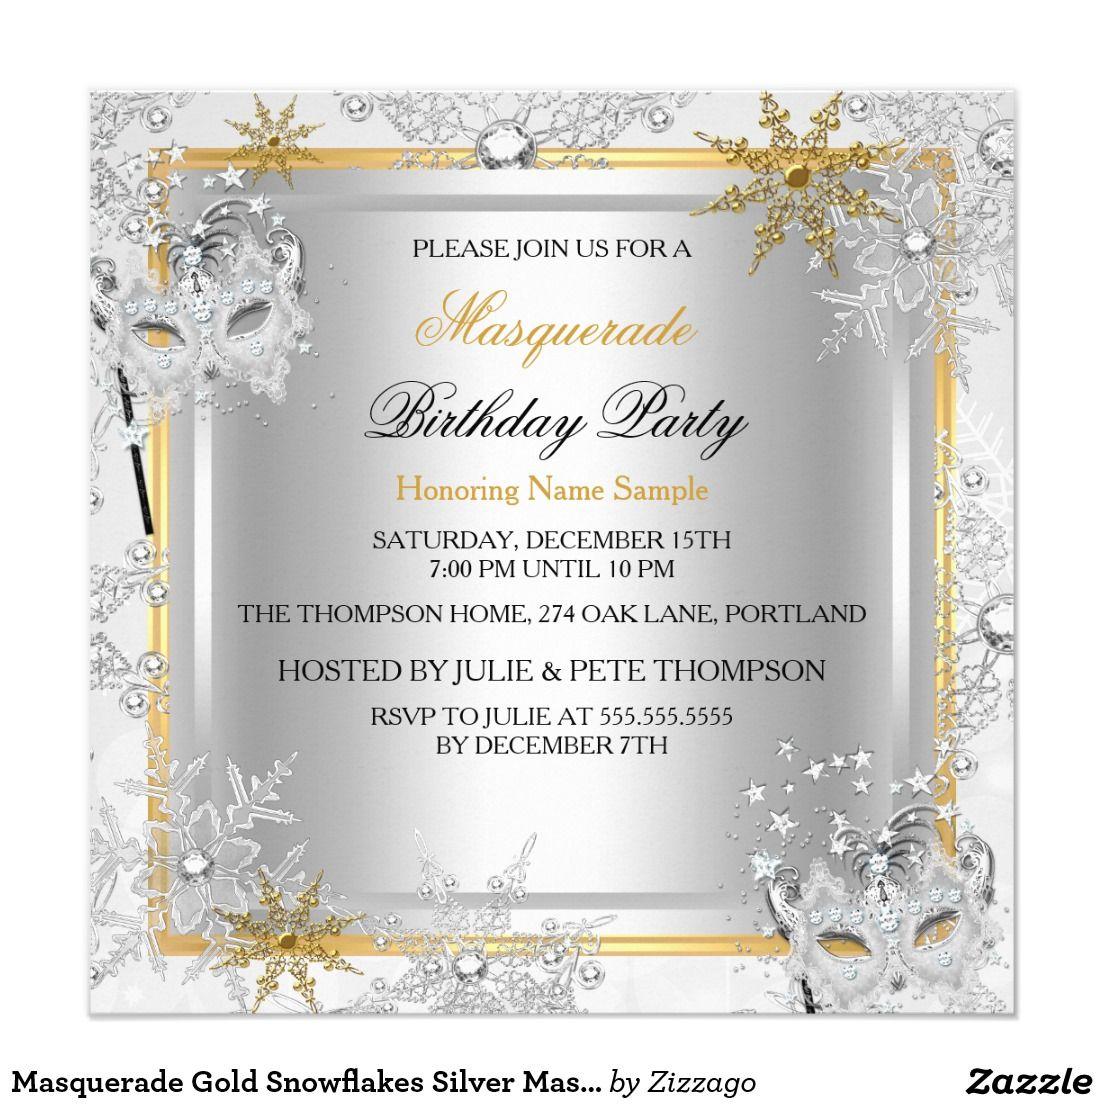 Masquerade Gold Snowflakes Silver Masks Party 2 5.25x5.25 Square ...